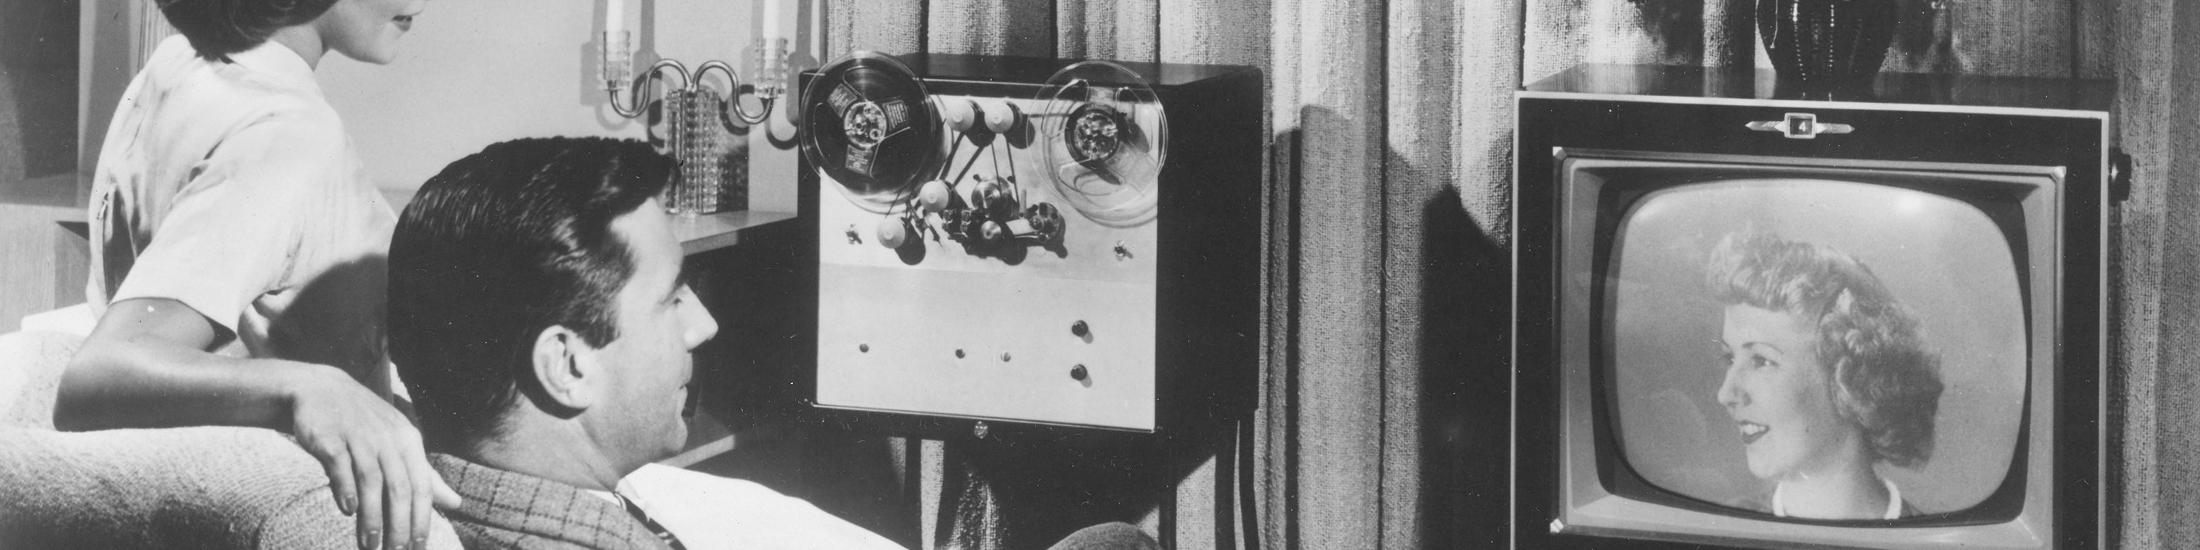 RCA home recording device, 1950-1969